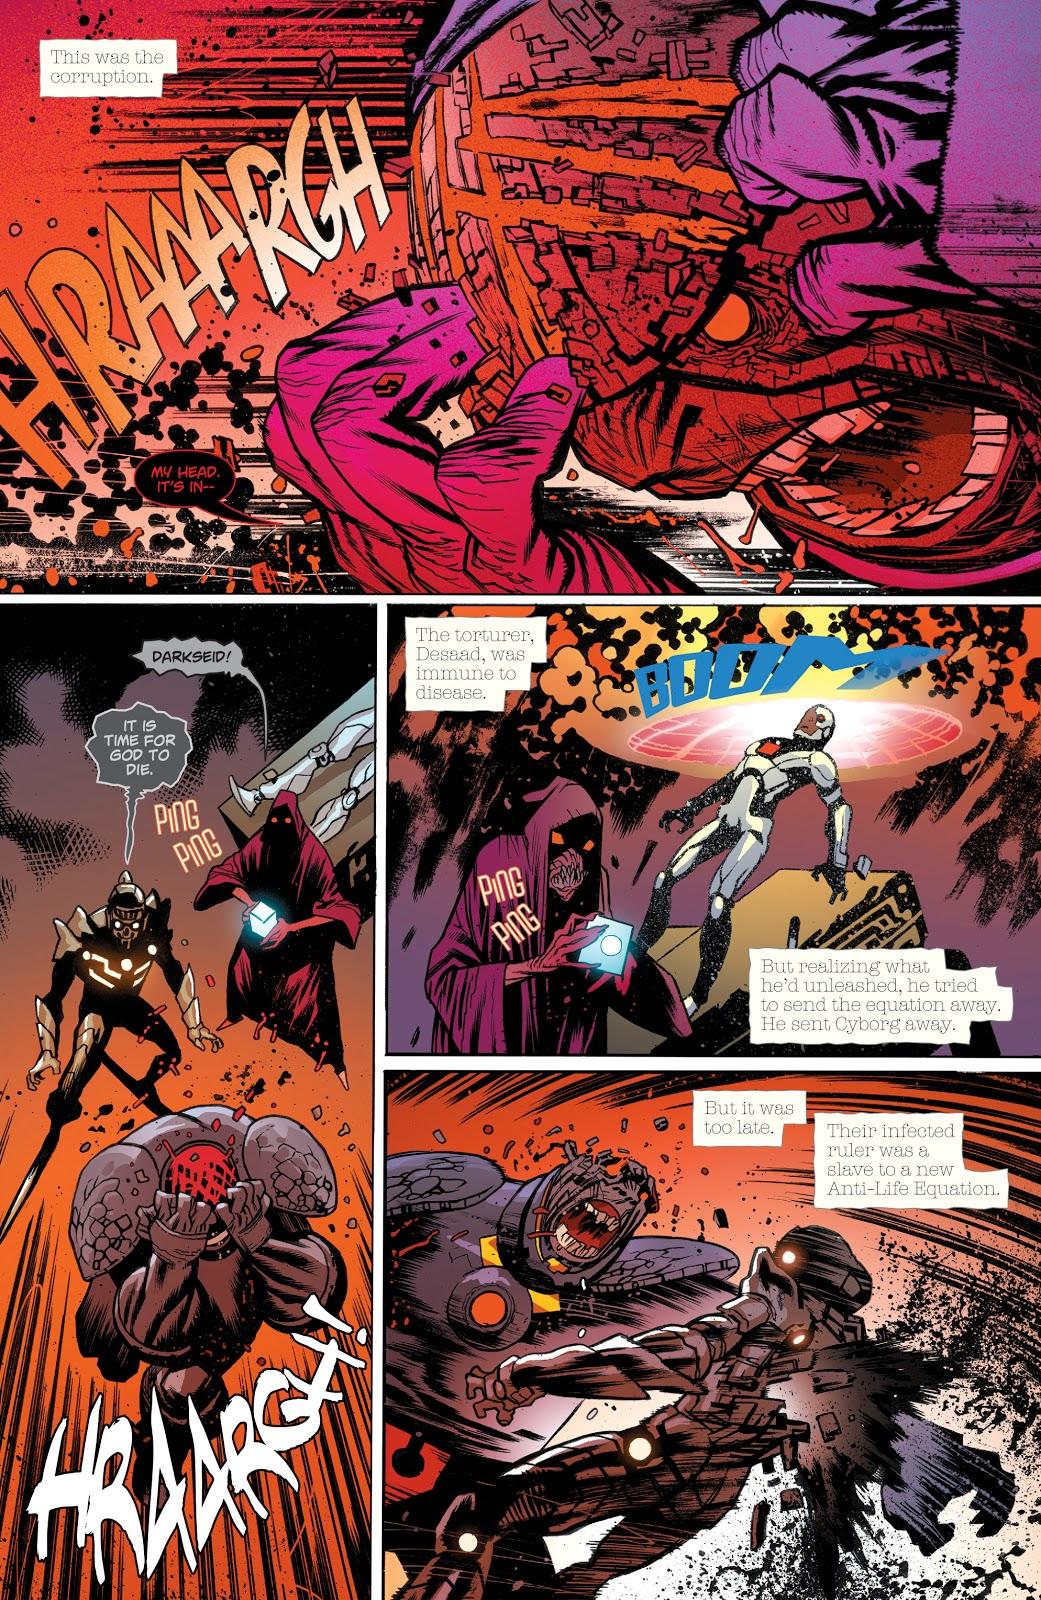 Darkseid Commits Suicide (DCeased)